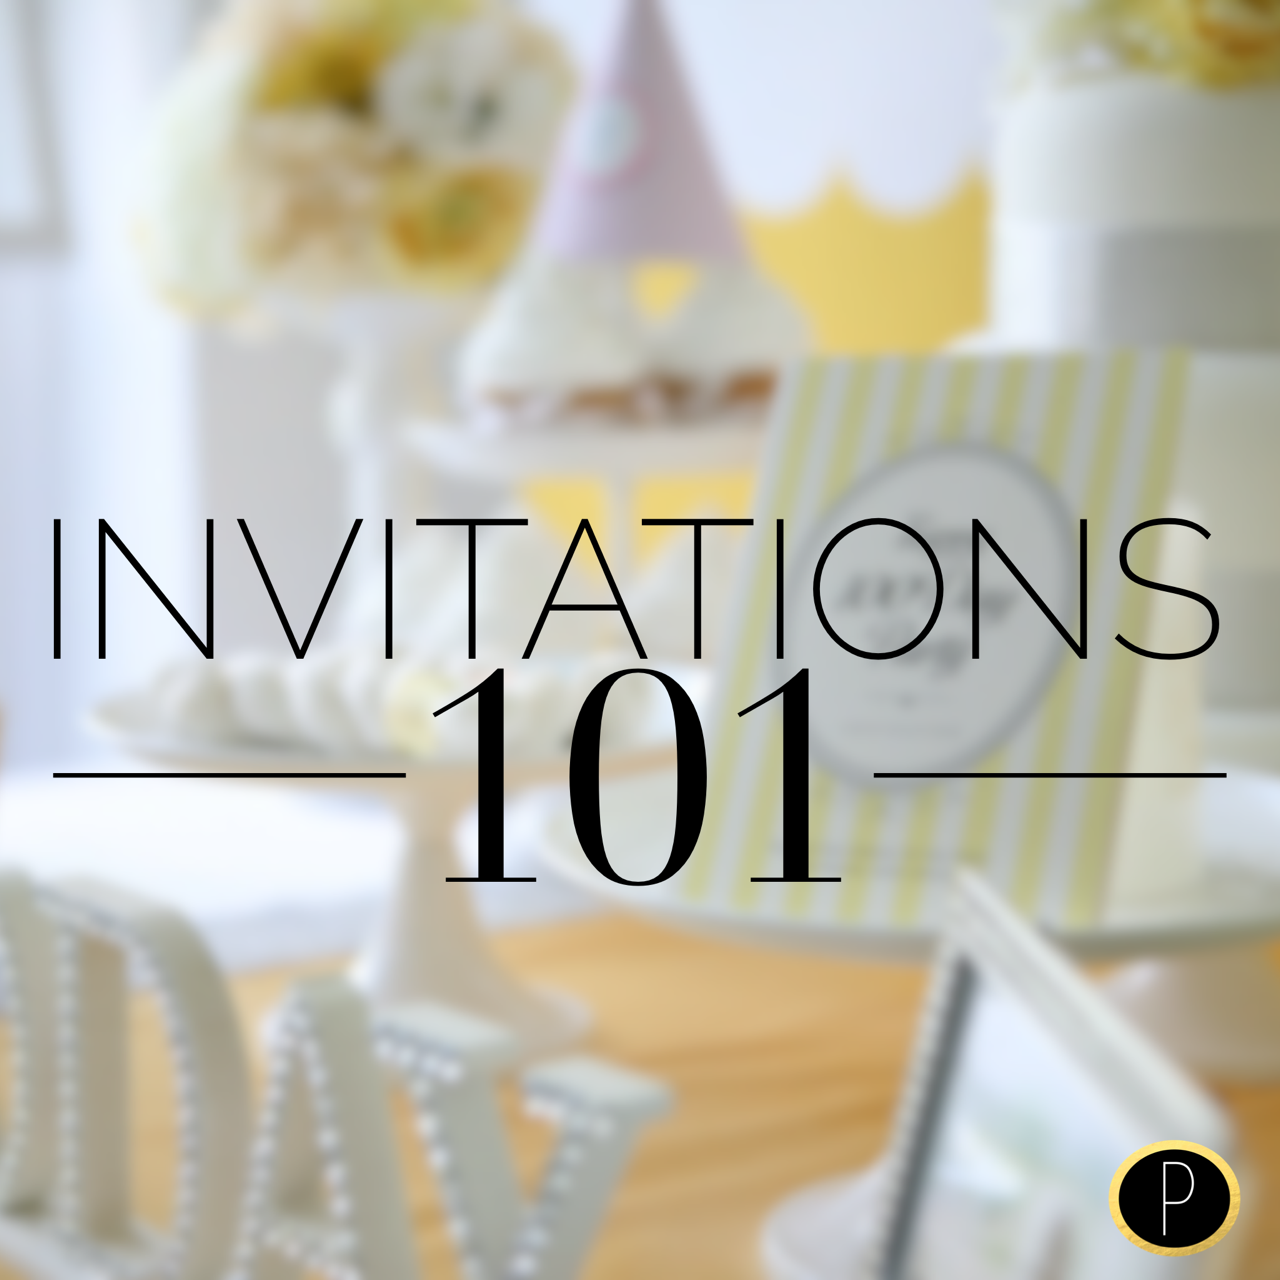 Invitations 101